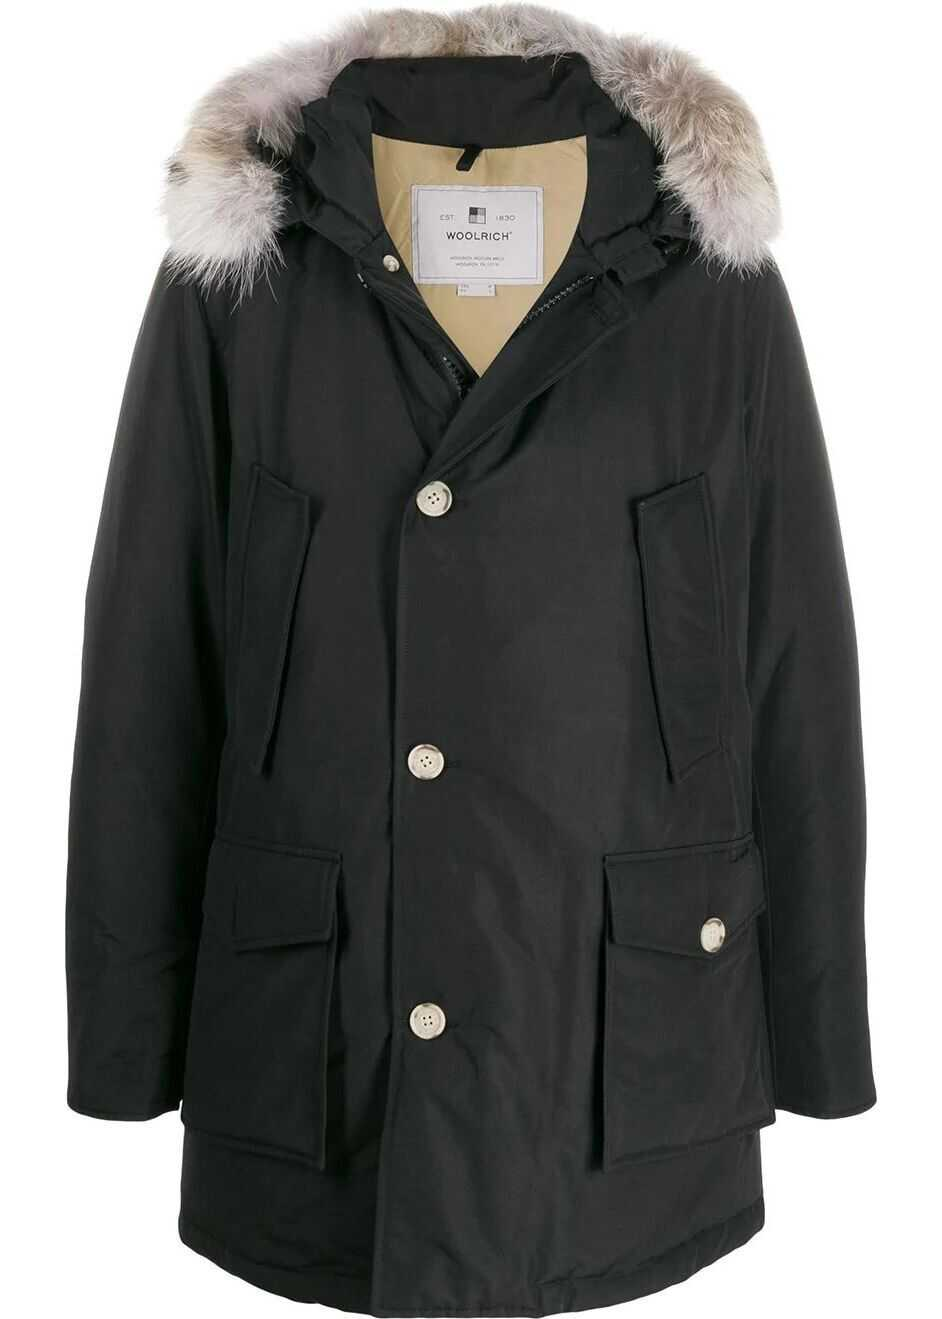 Woolrich Cotton Outerwear Jacket BLACK